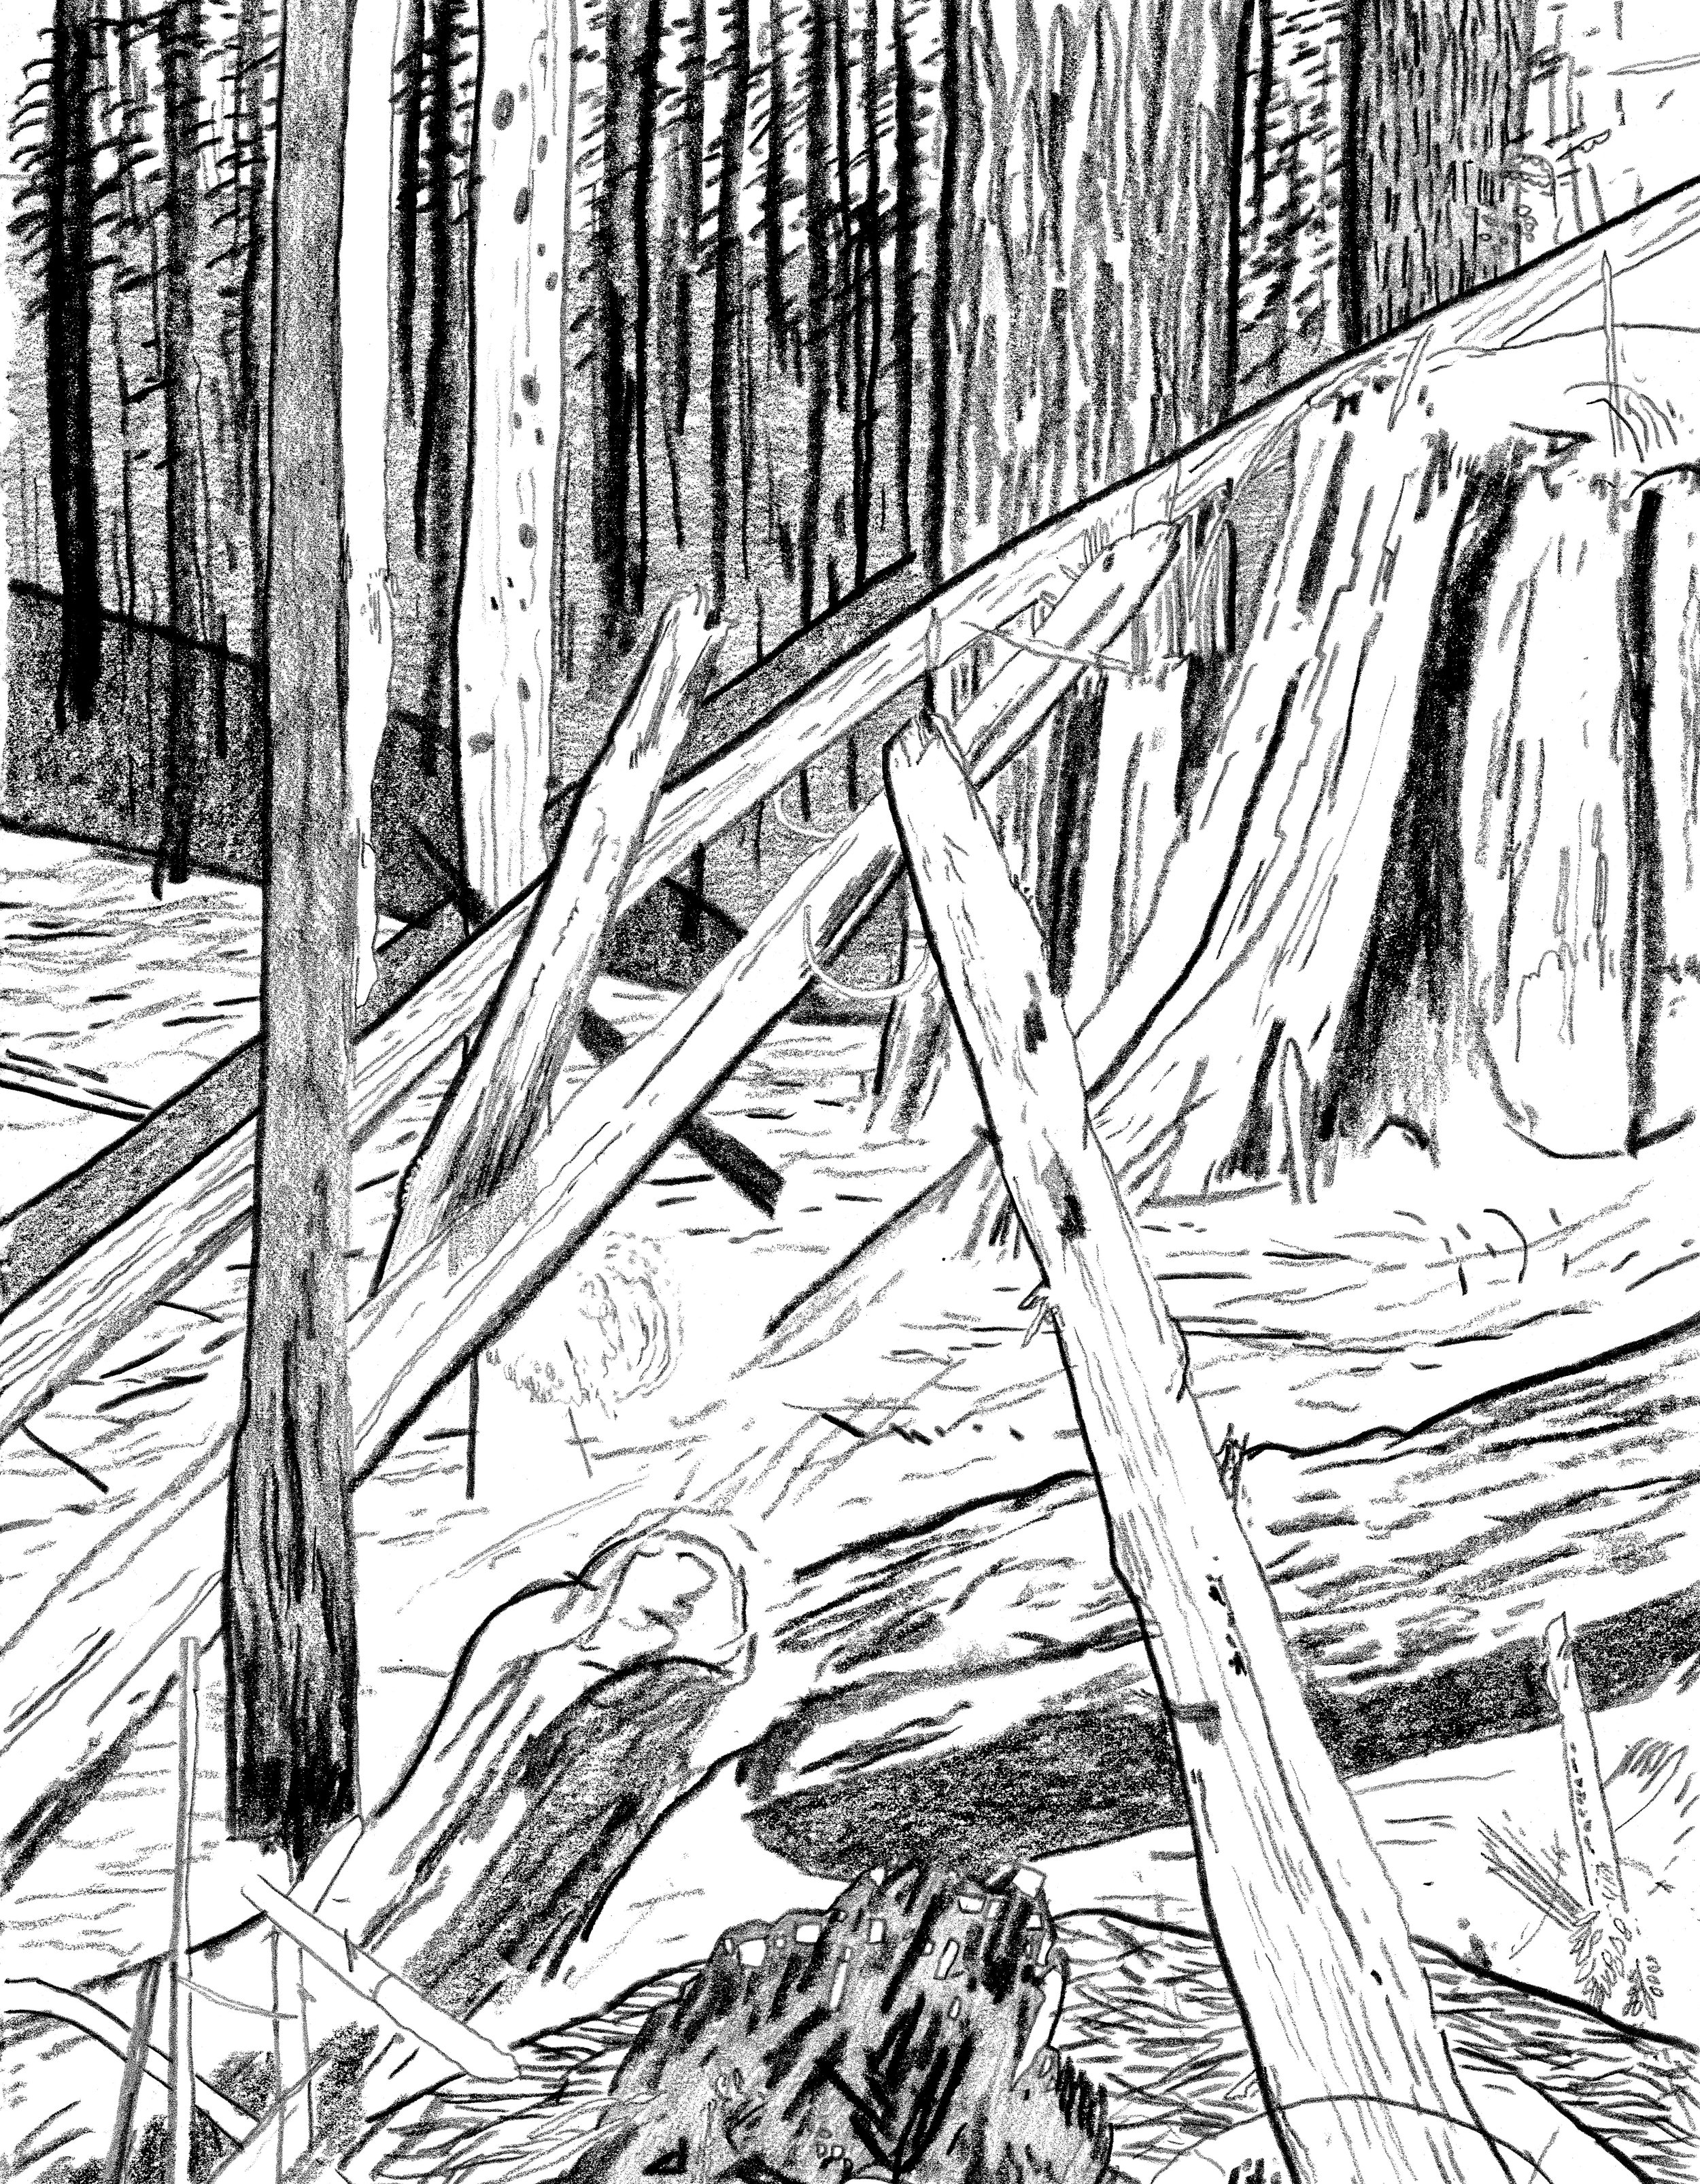 Heaps Near Coquitlam - Graphite On Paper - 8.5'' x 11'' - 2017